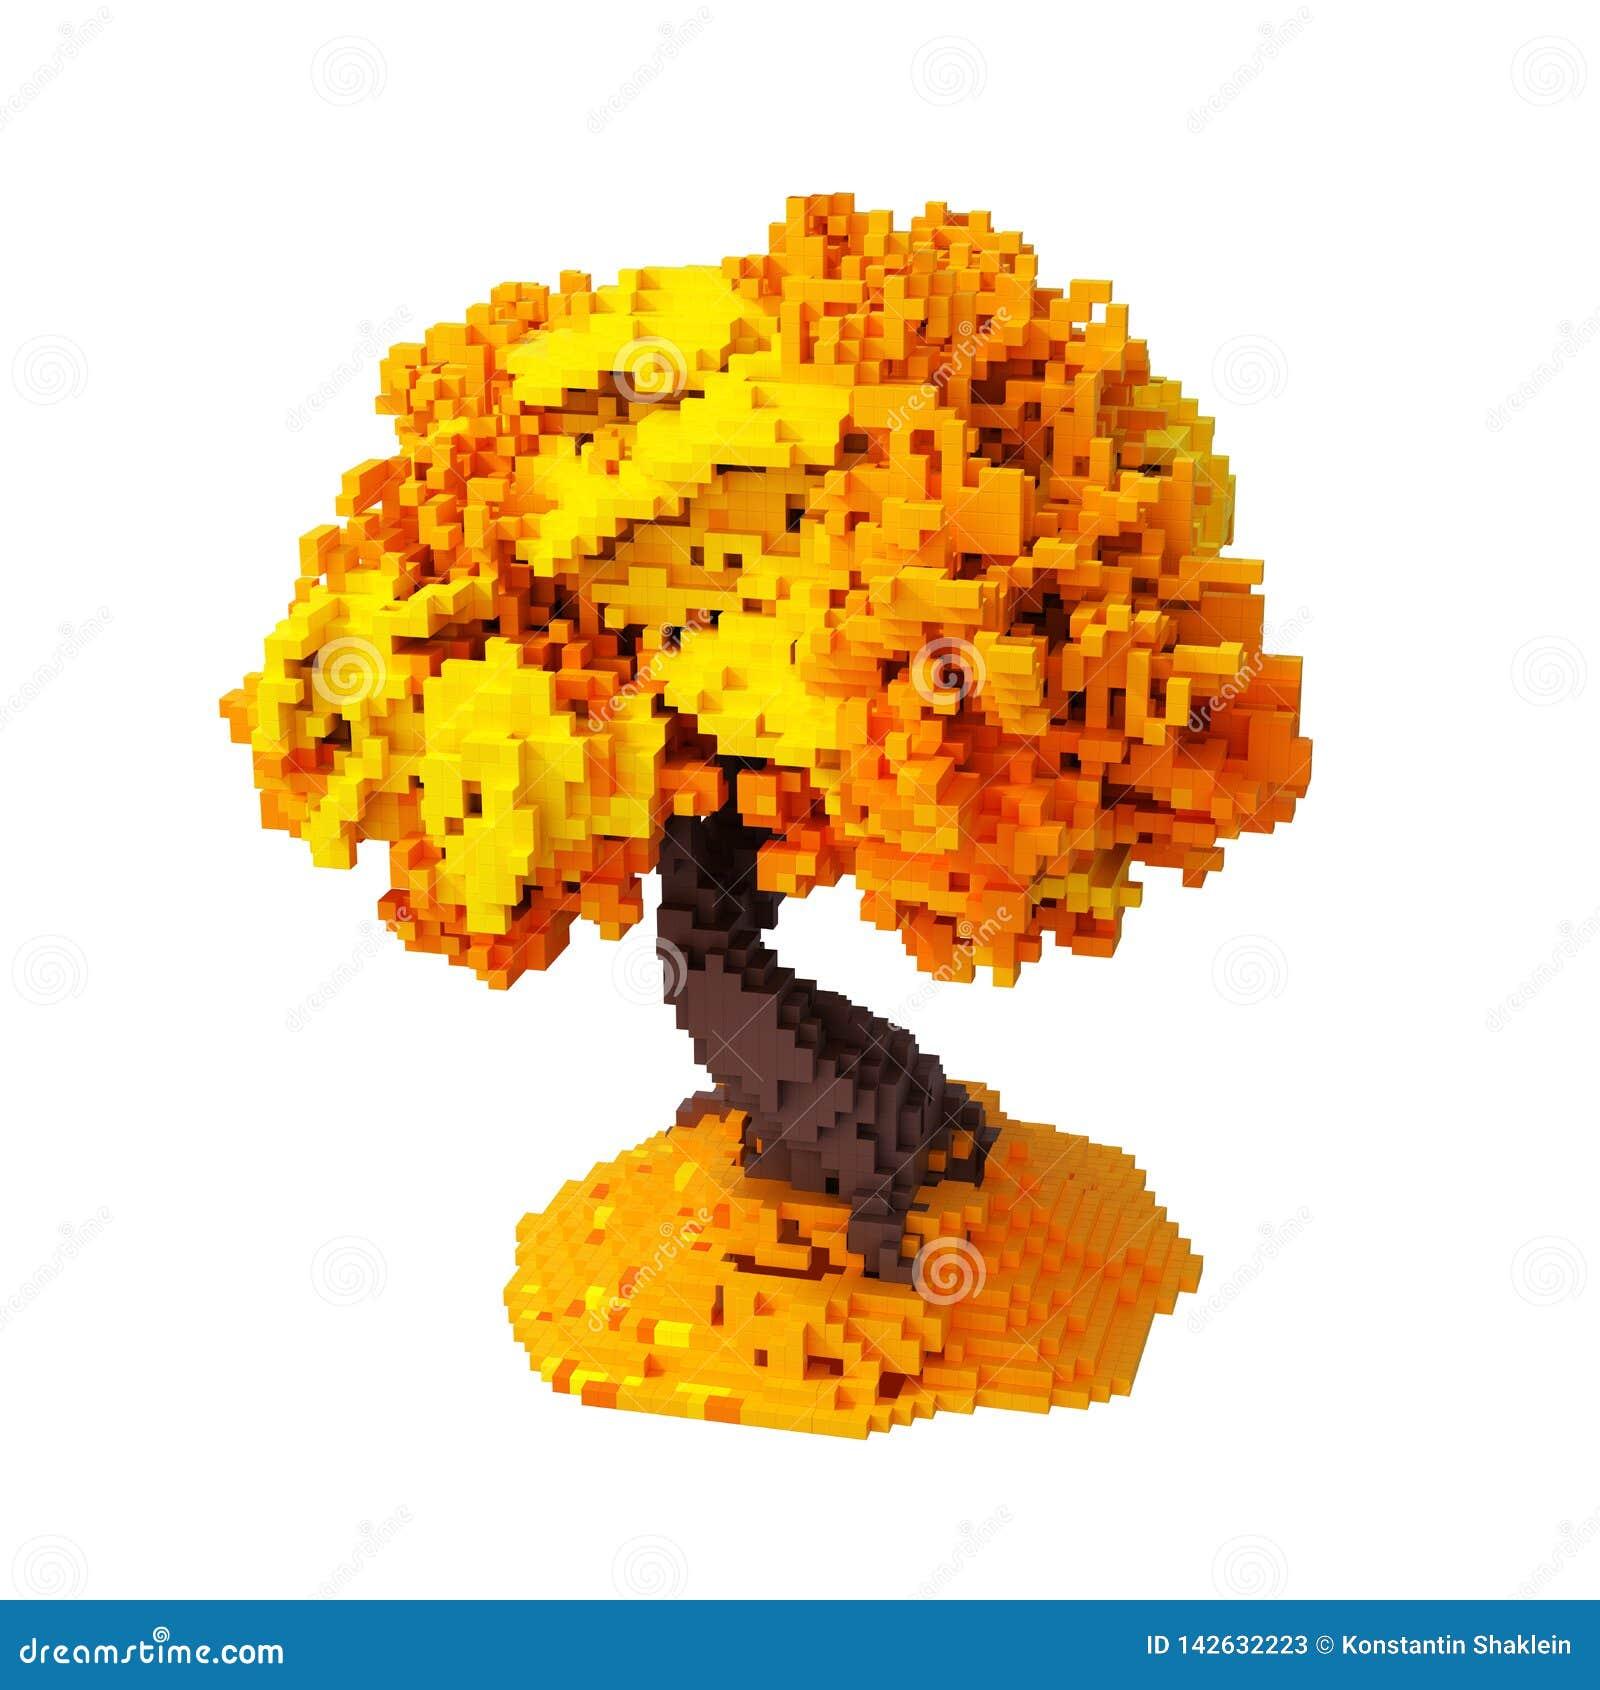 Autumn Digital Pixelated Tree Isolated en el fondo blanco